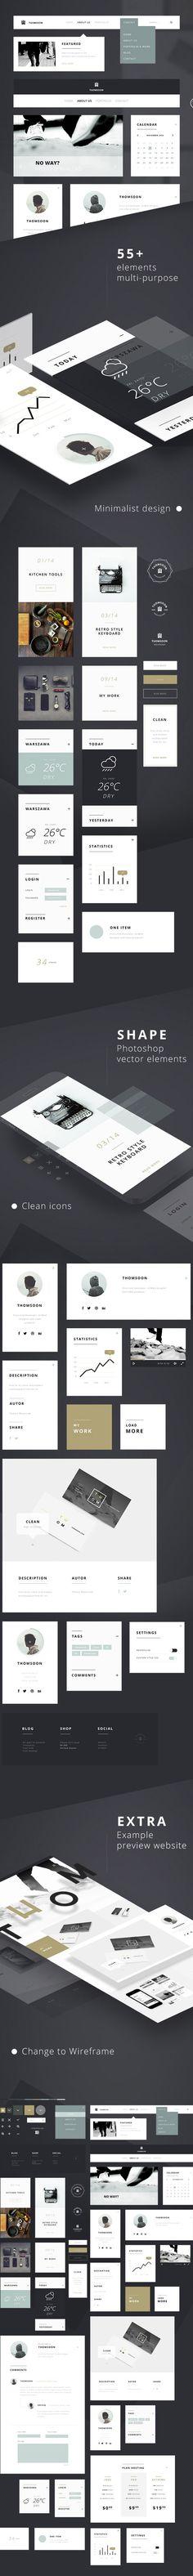 55-free-ui-kit-elements - UI-Kits